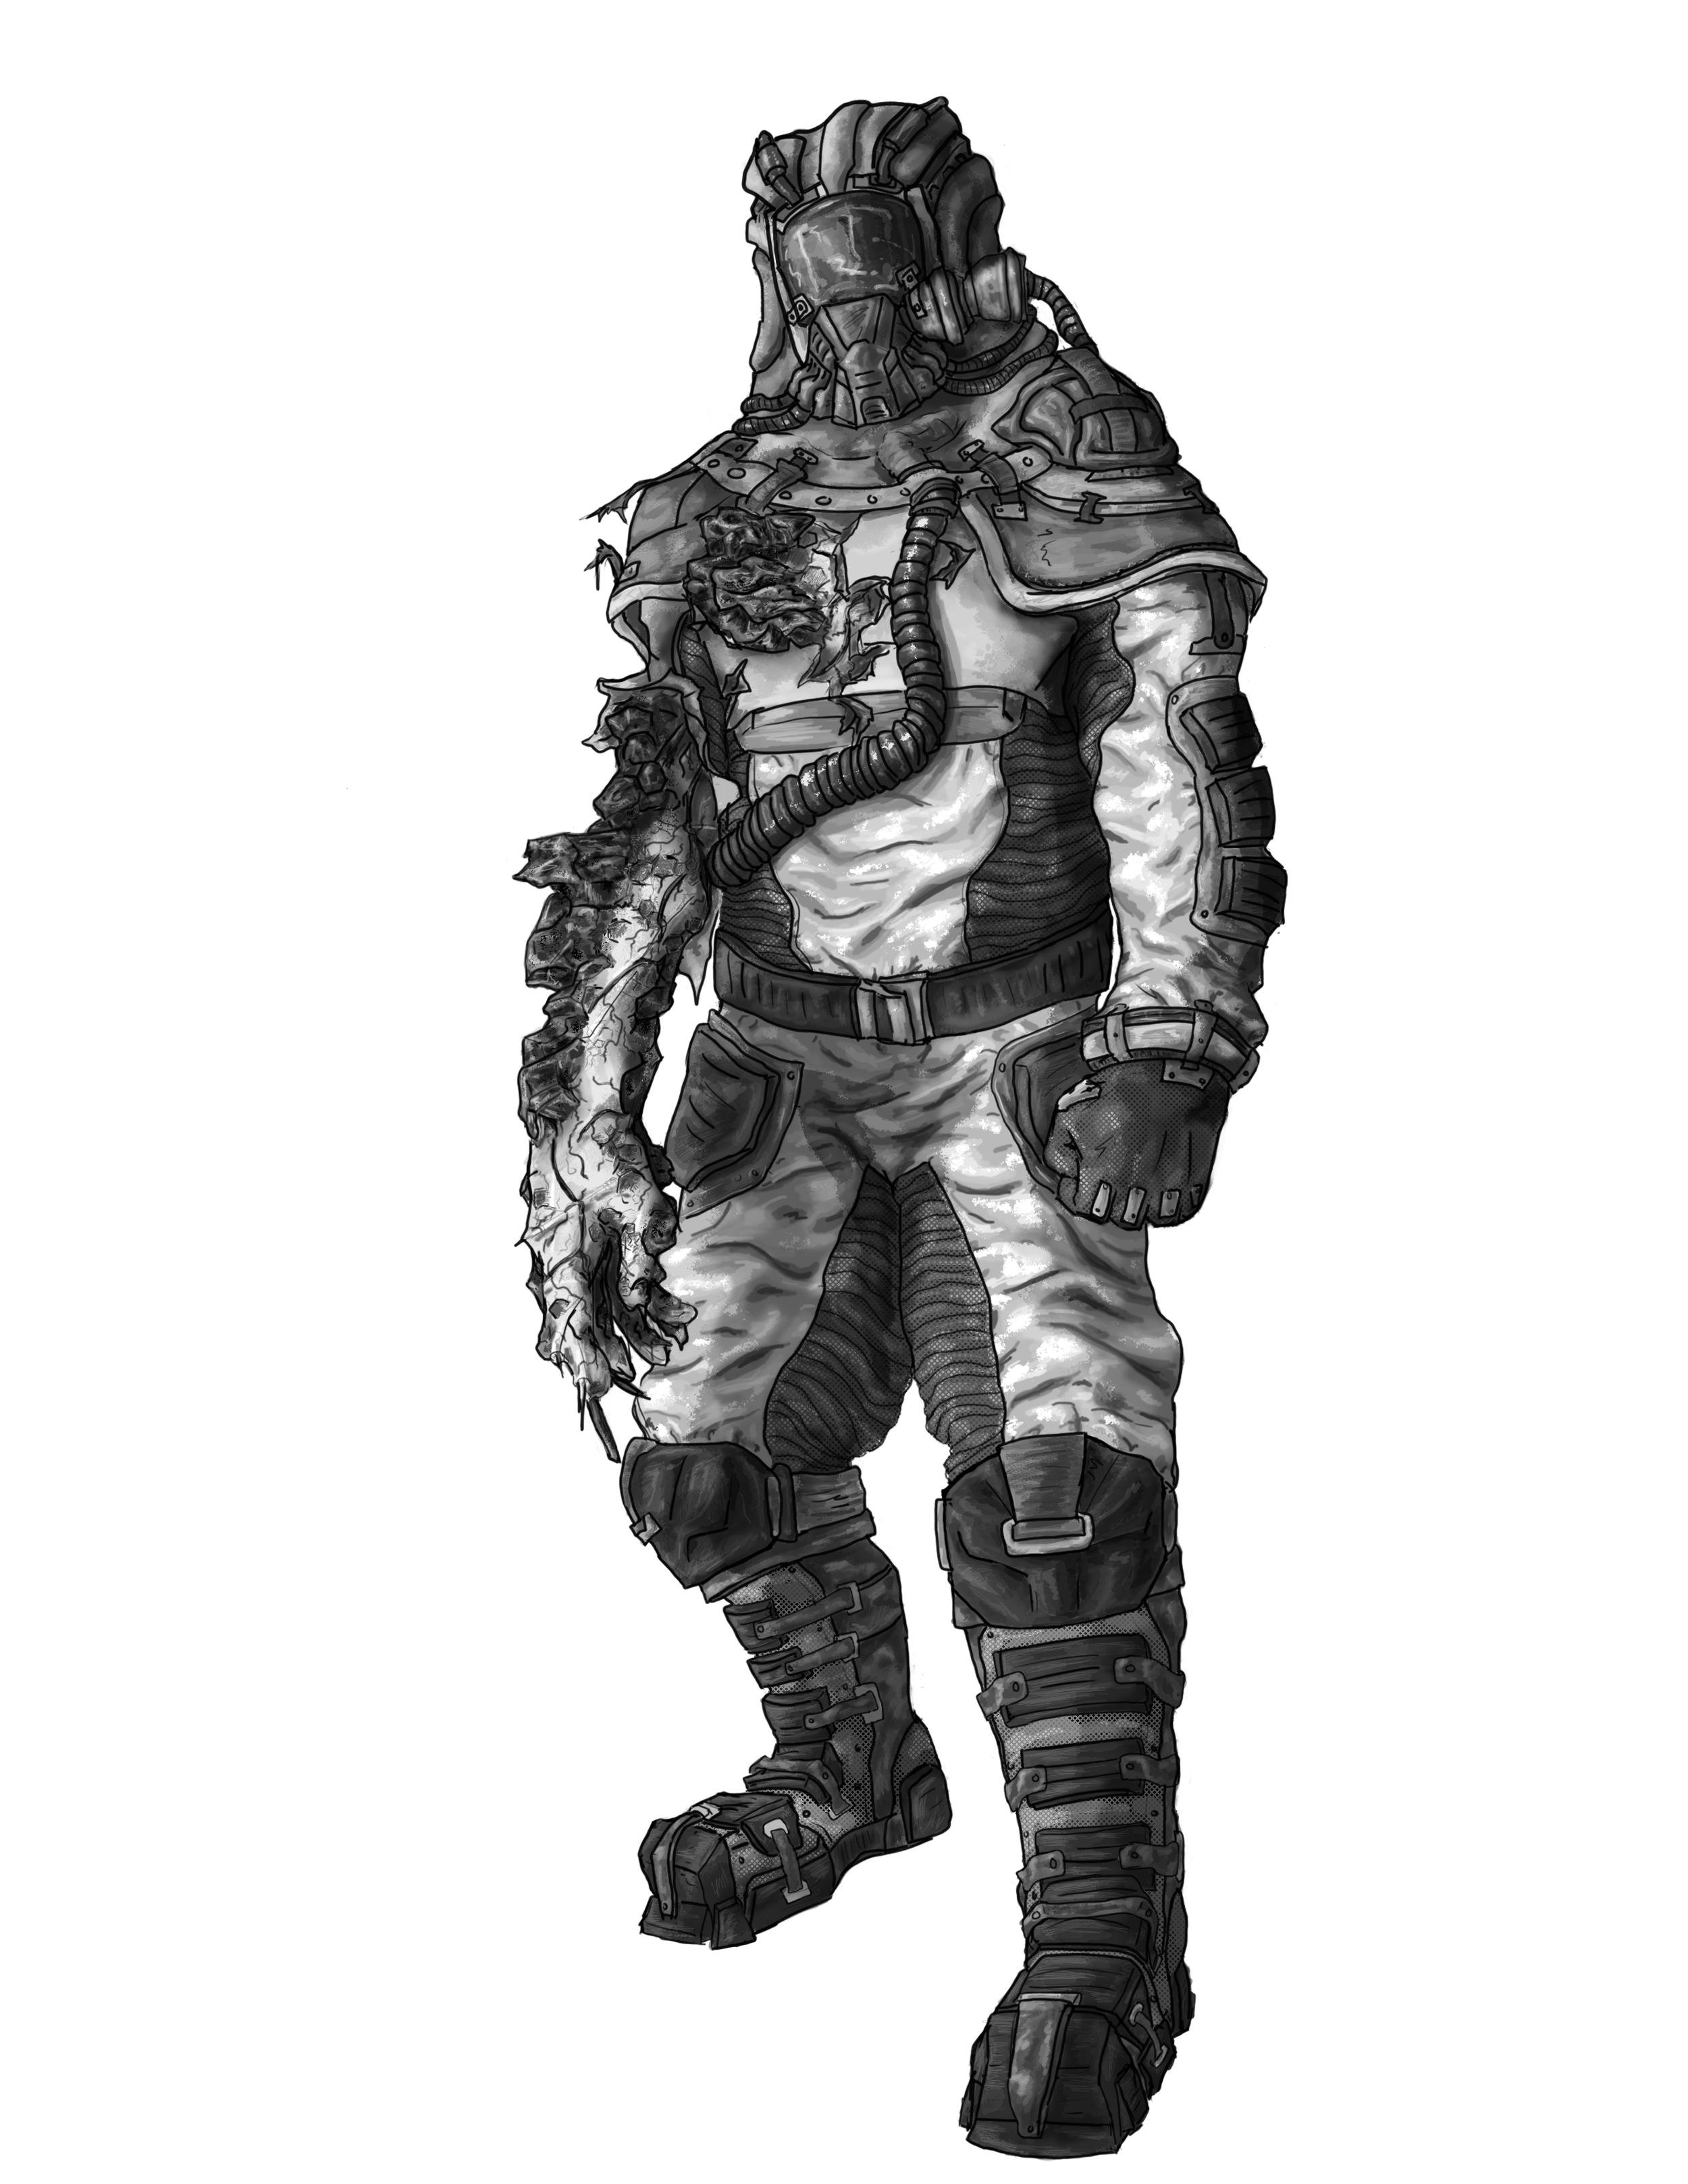 Enemy Scientist - Higher Level Hazmat